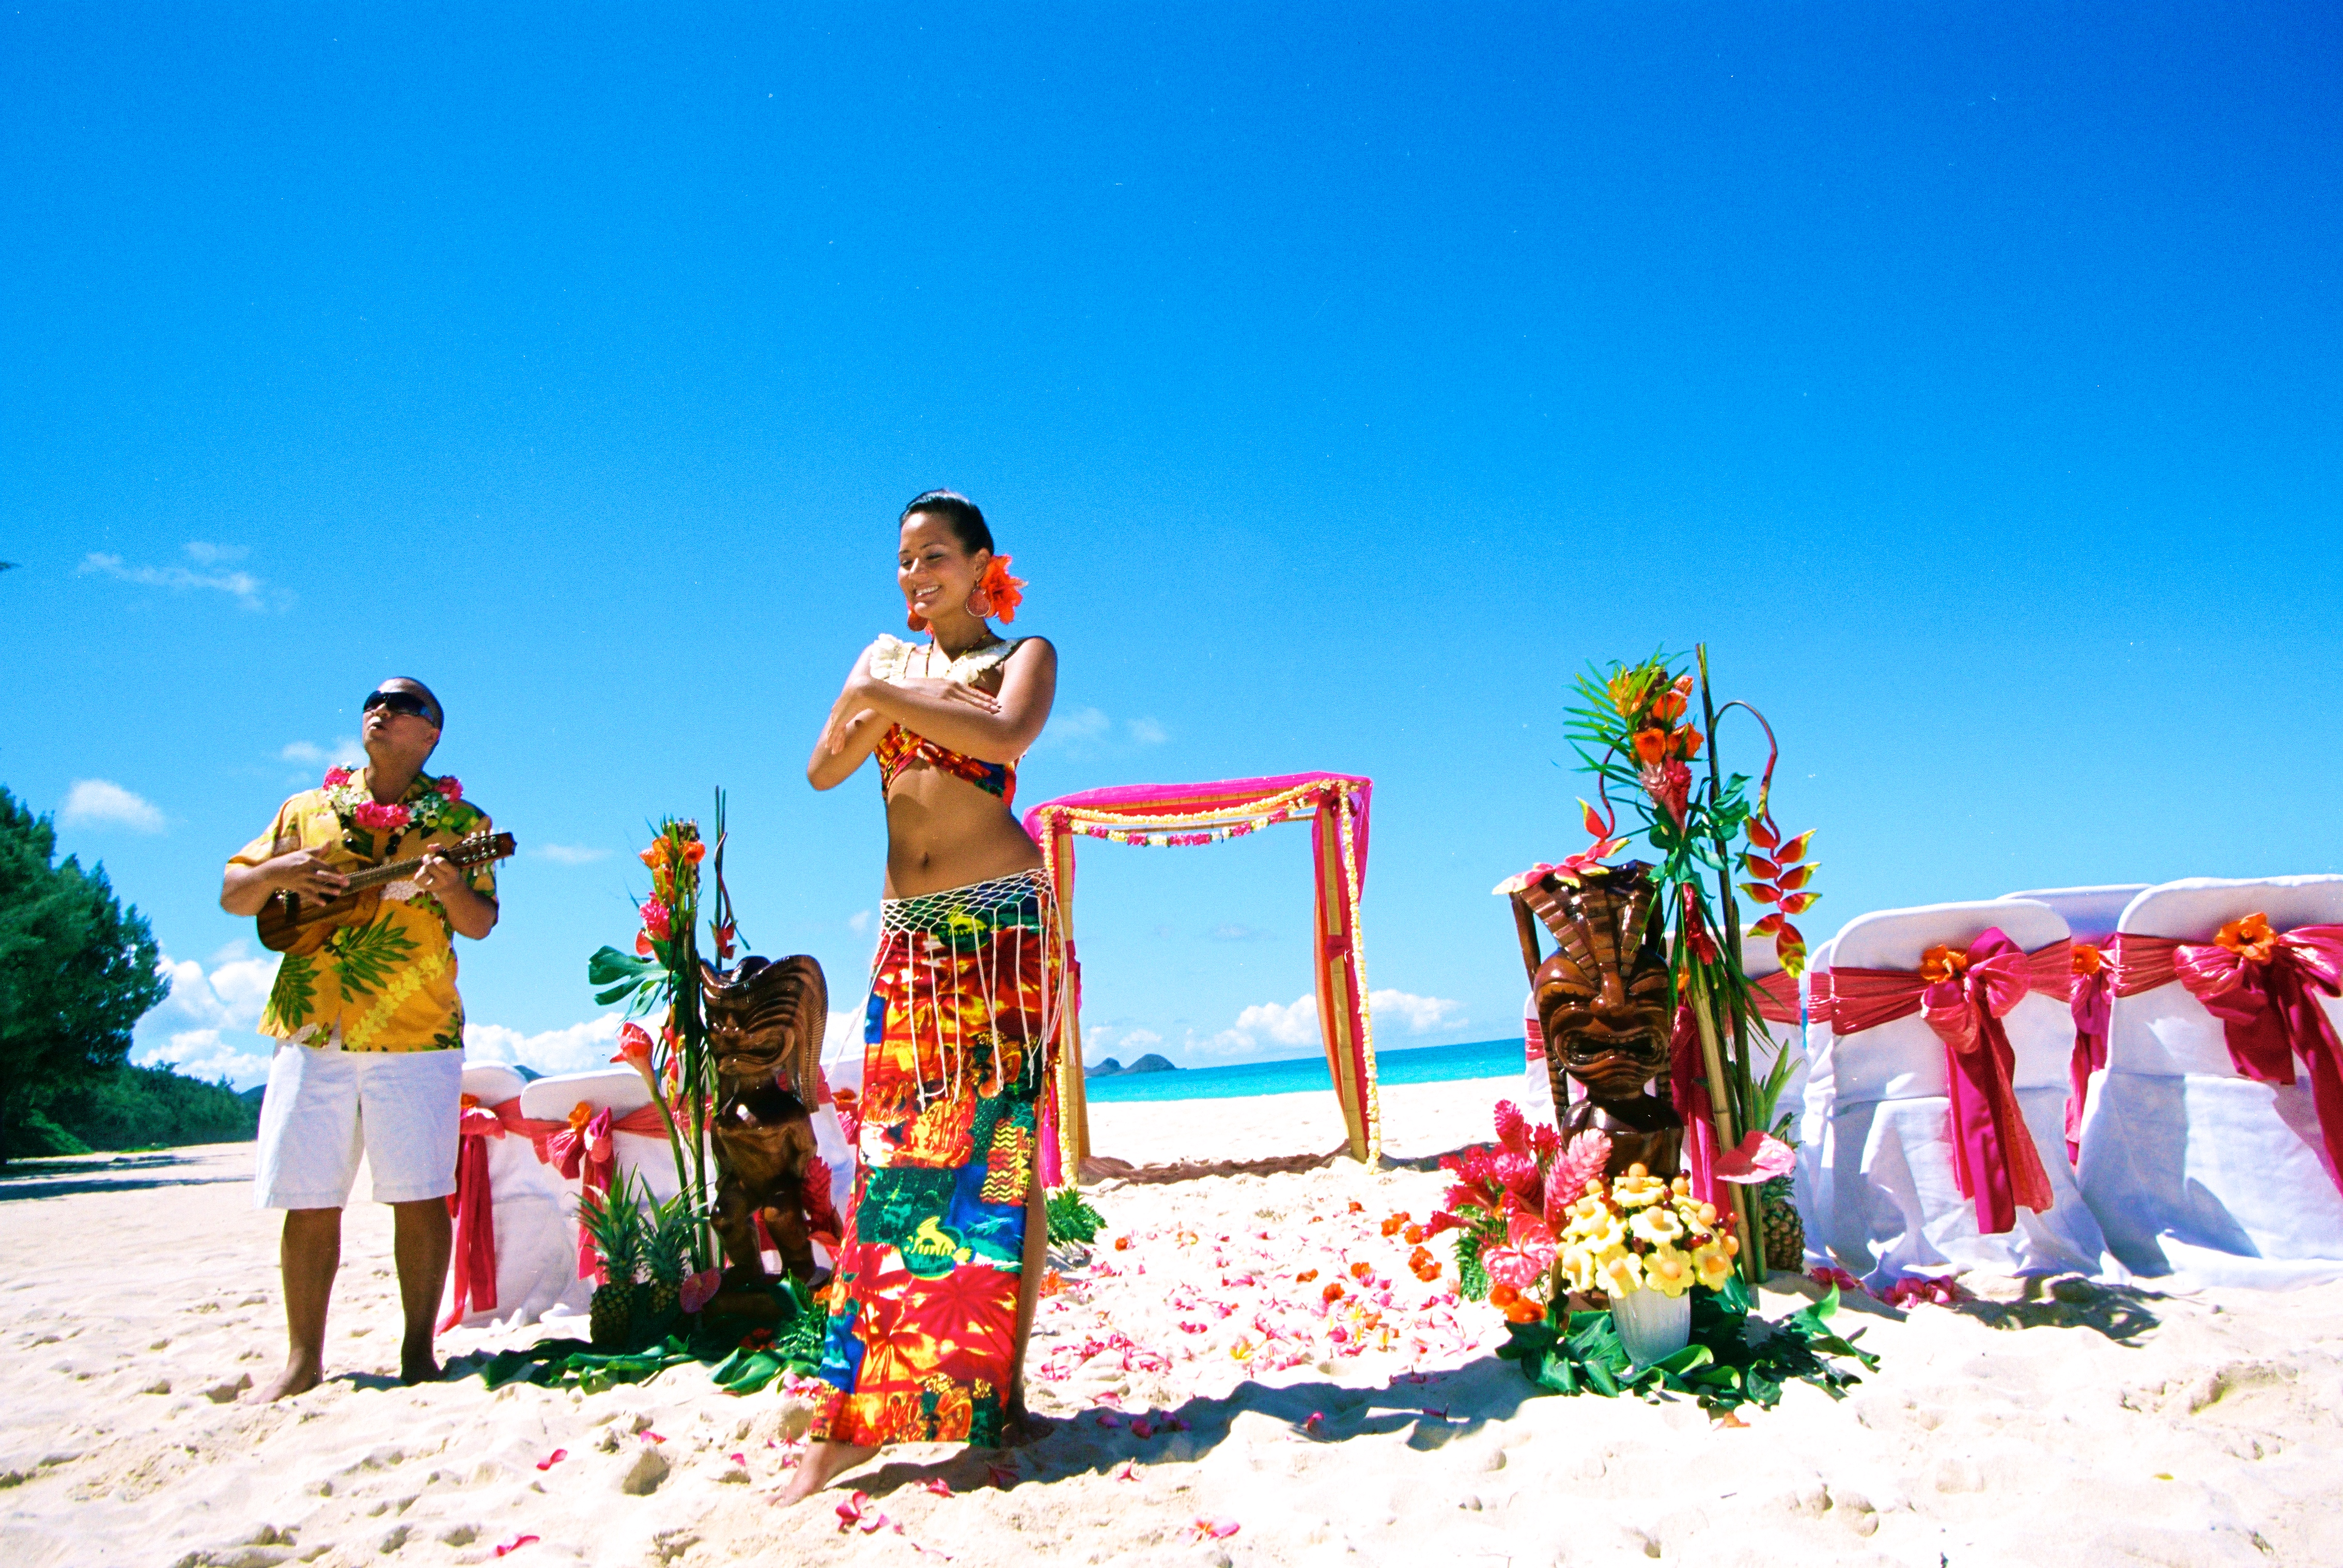 Hawaiian hula dancer with Ukulele 7